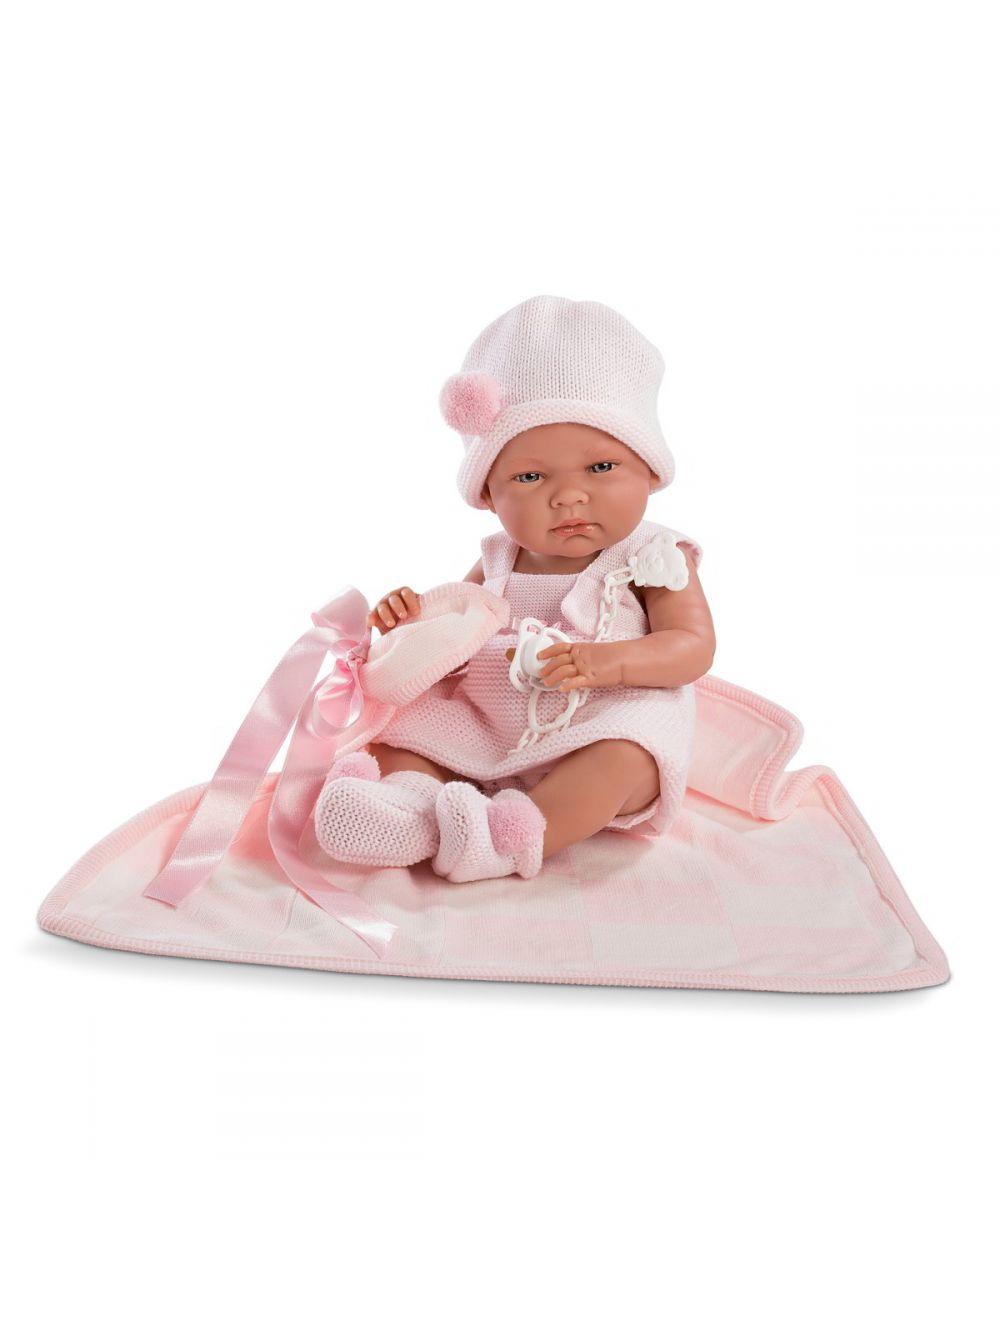 LLORENS Lalka Nica w różowej sukience 38 cm